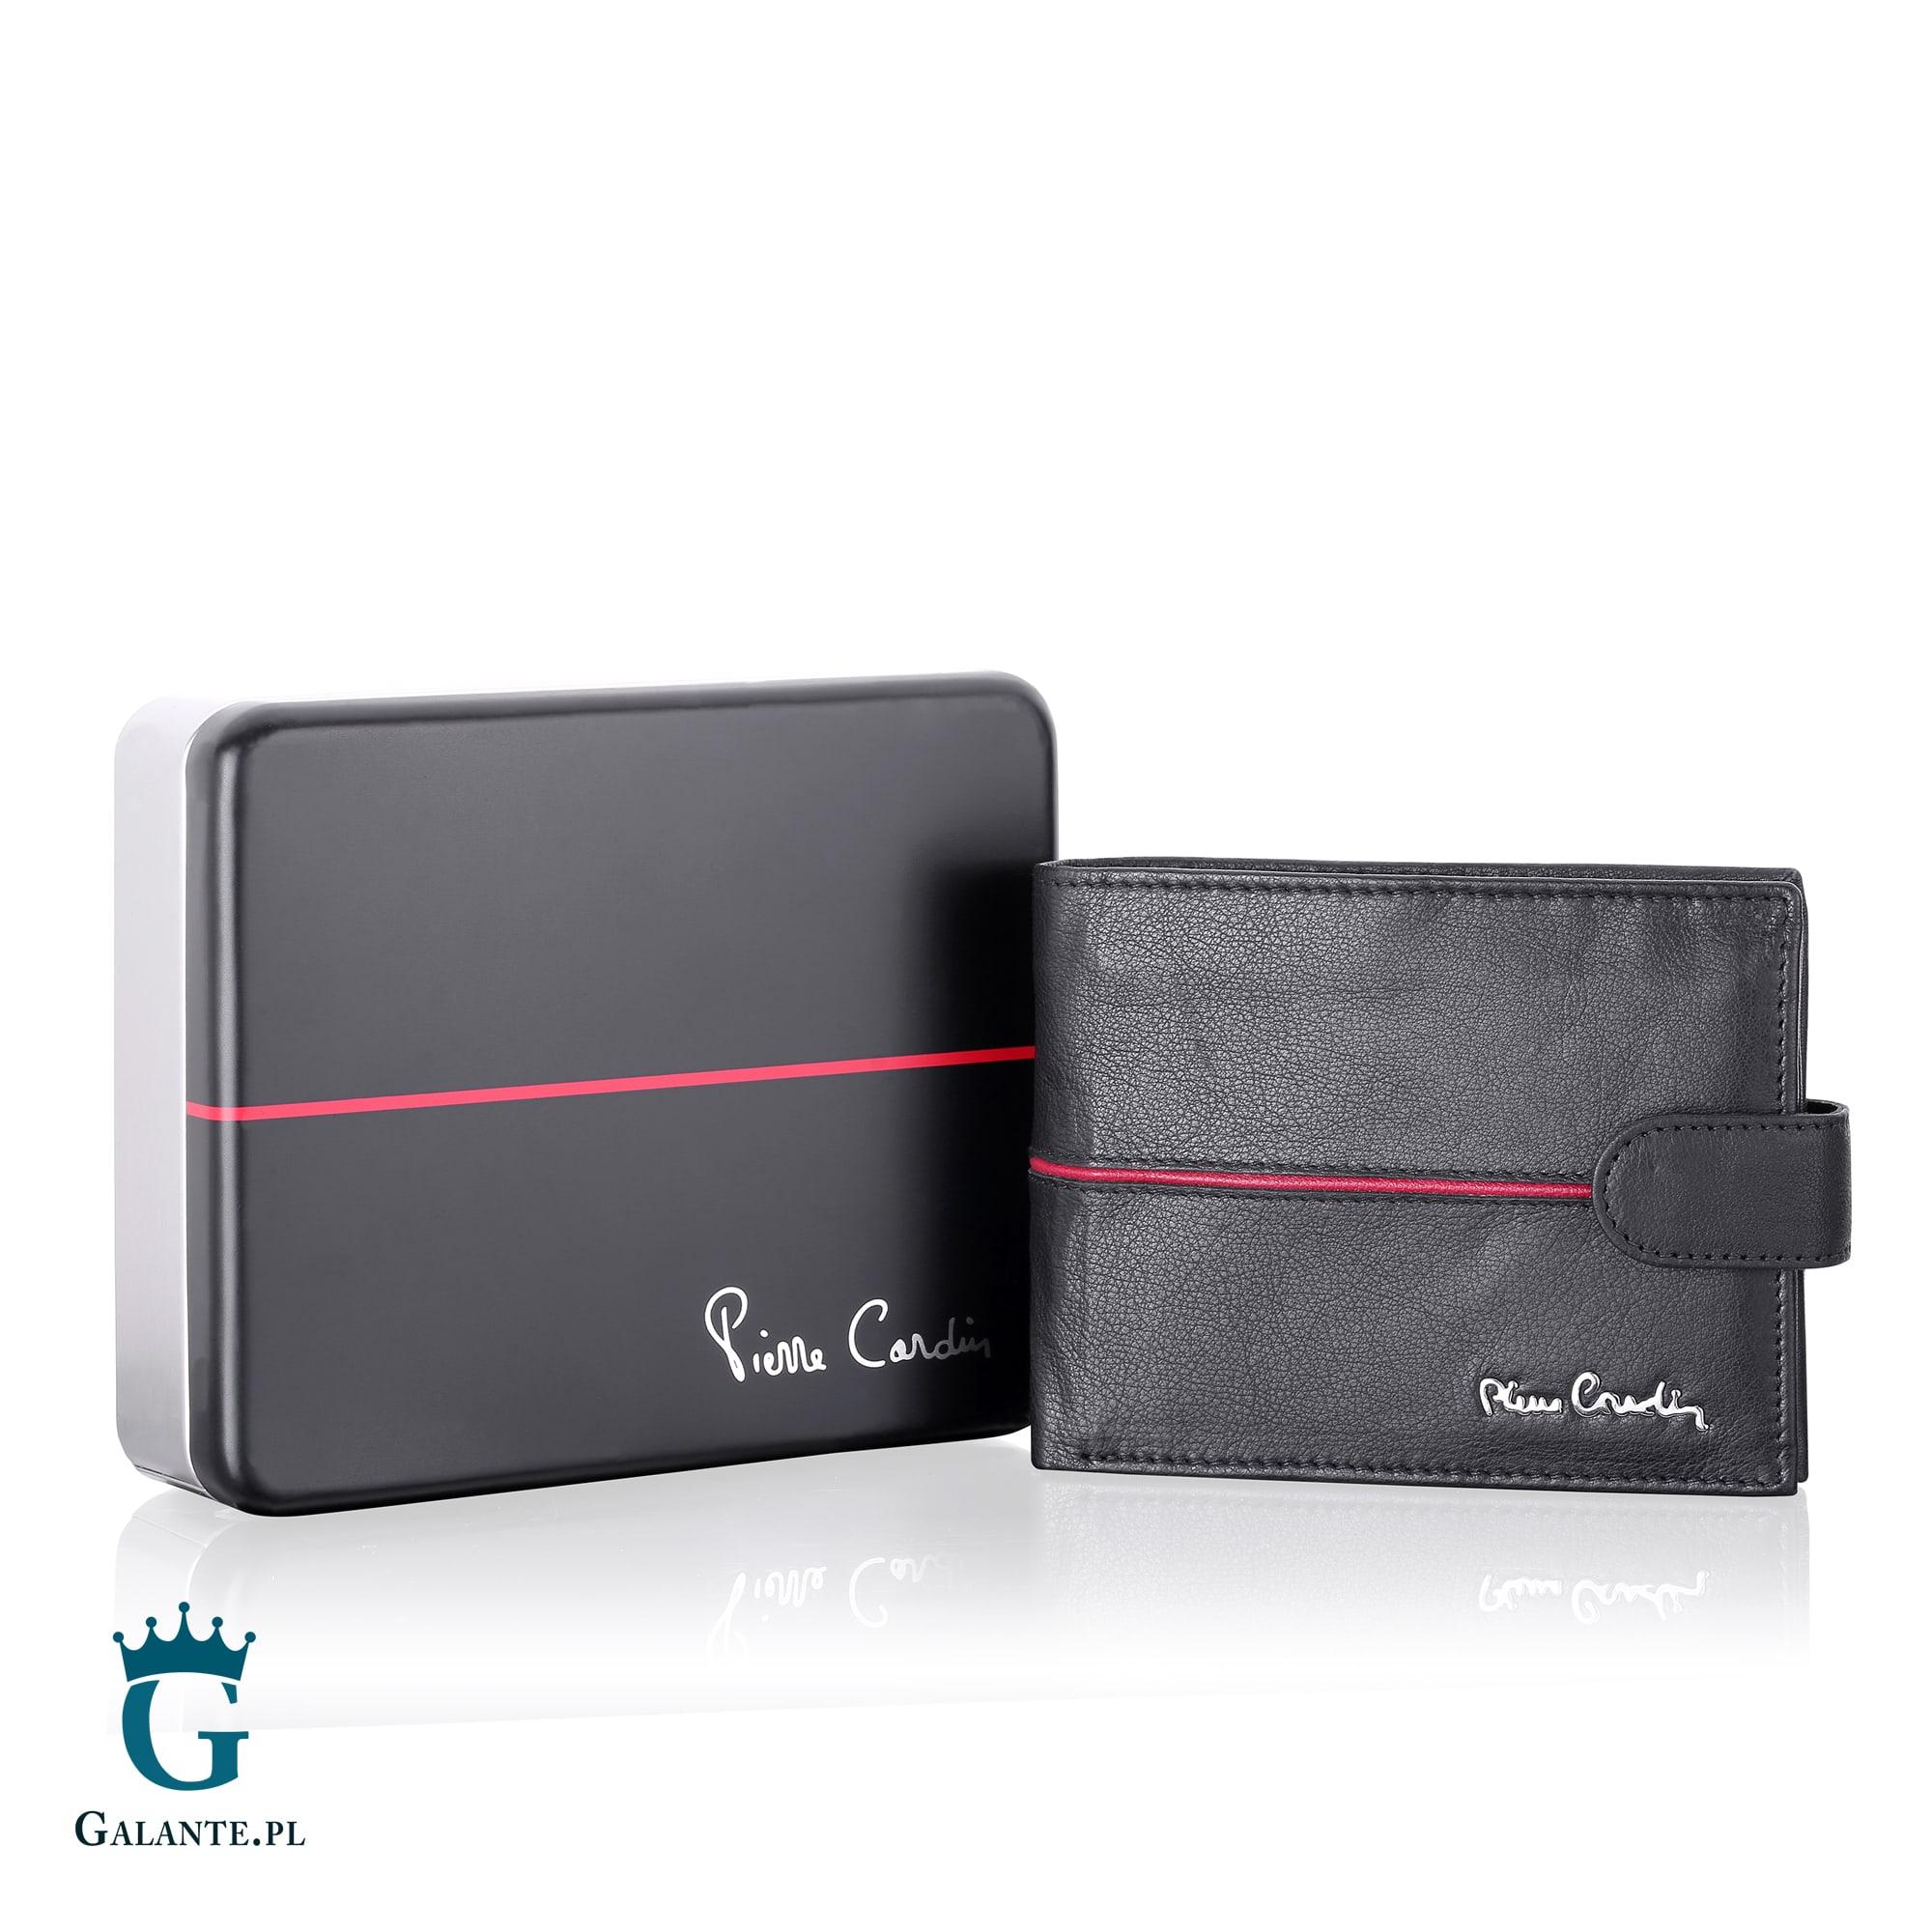 048a2b1c3d0ea Portfel Męski Pierre Cardin Black Red GA02 324A